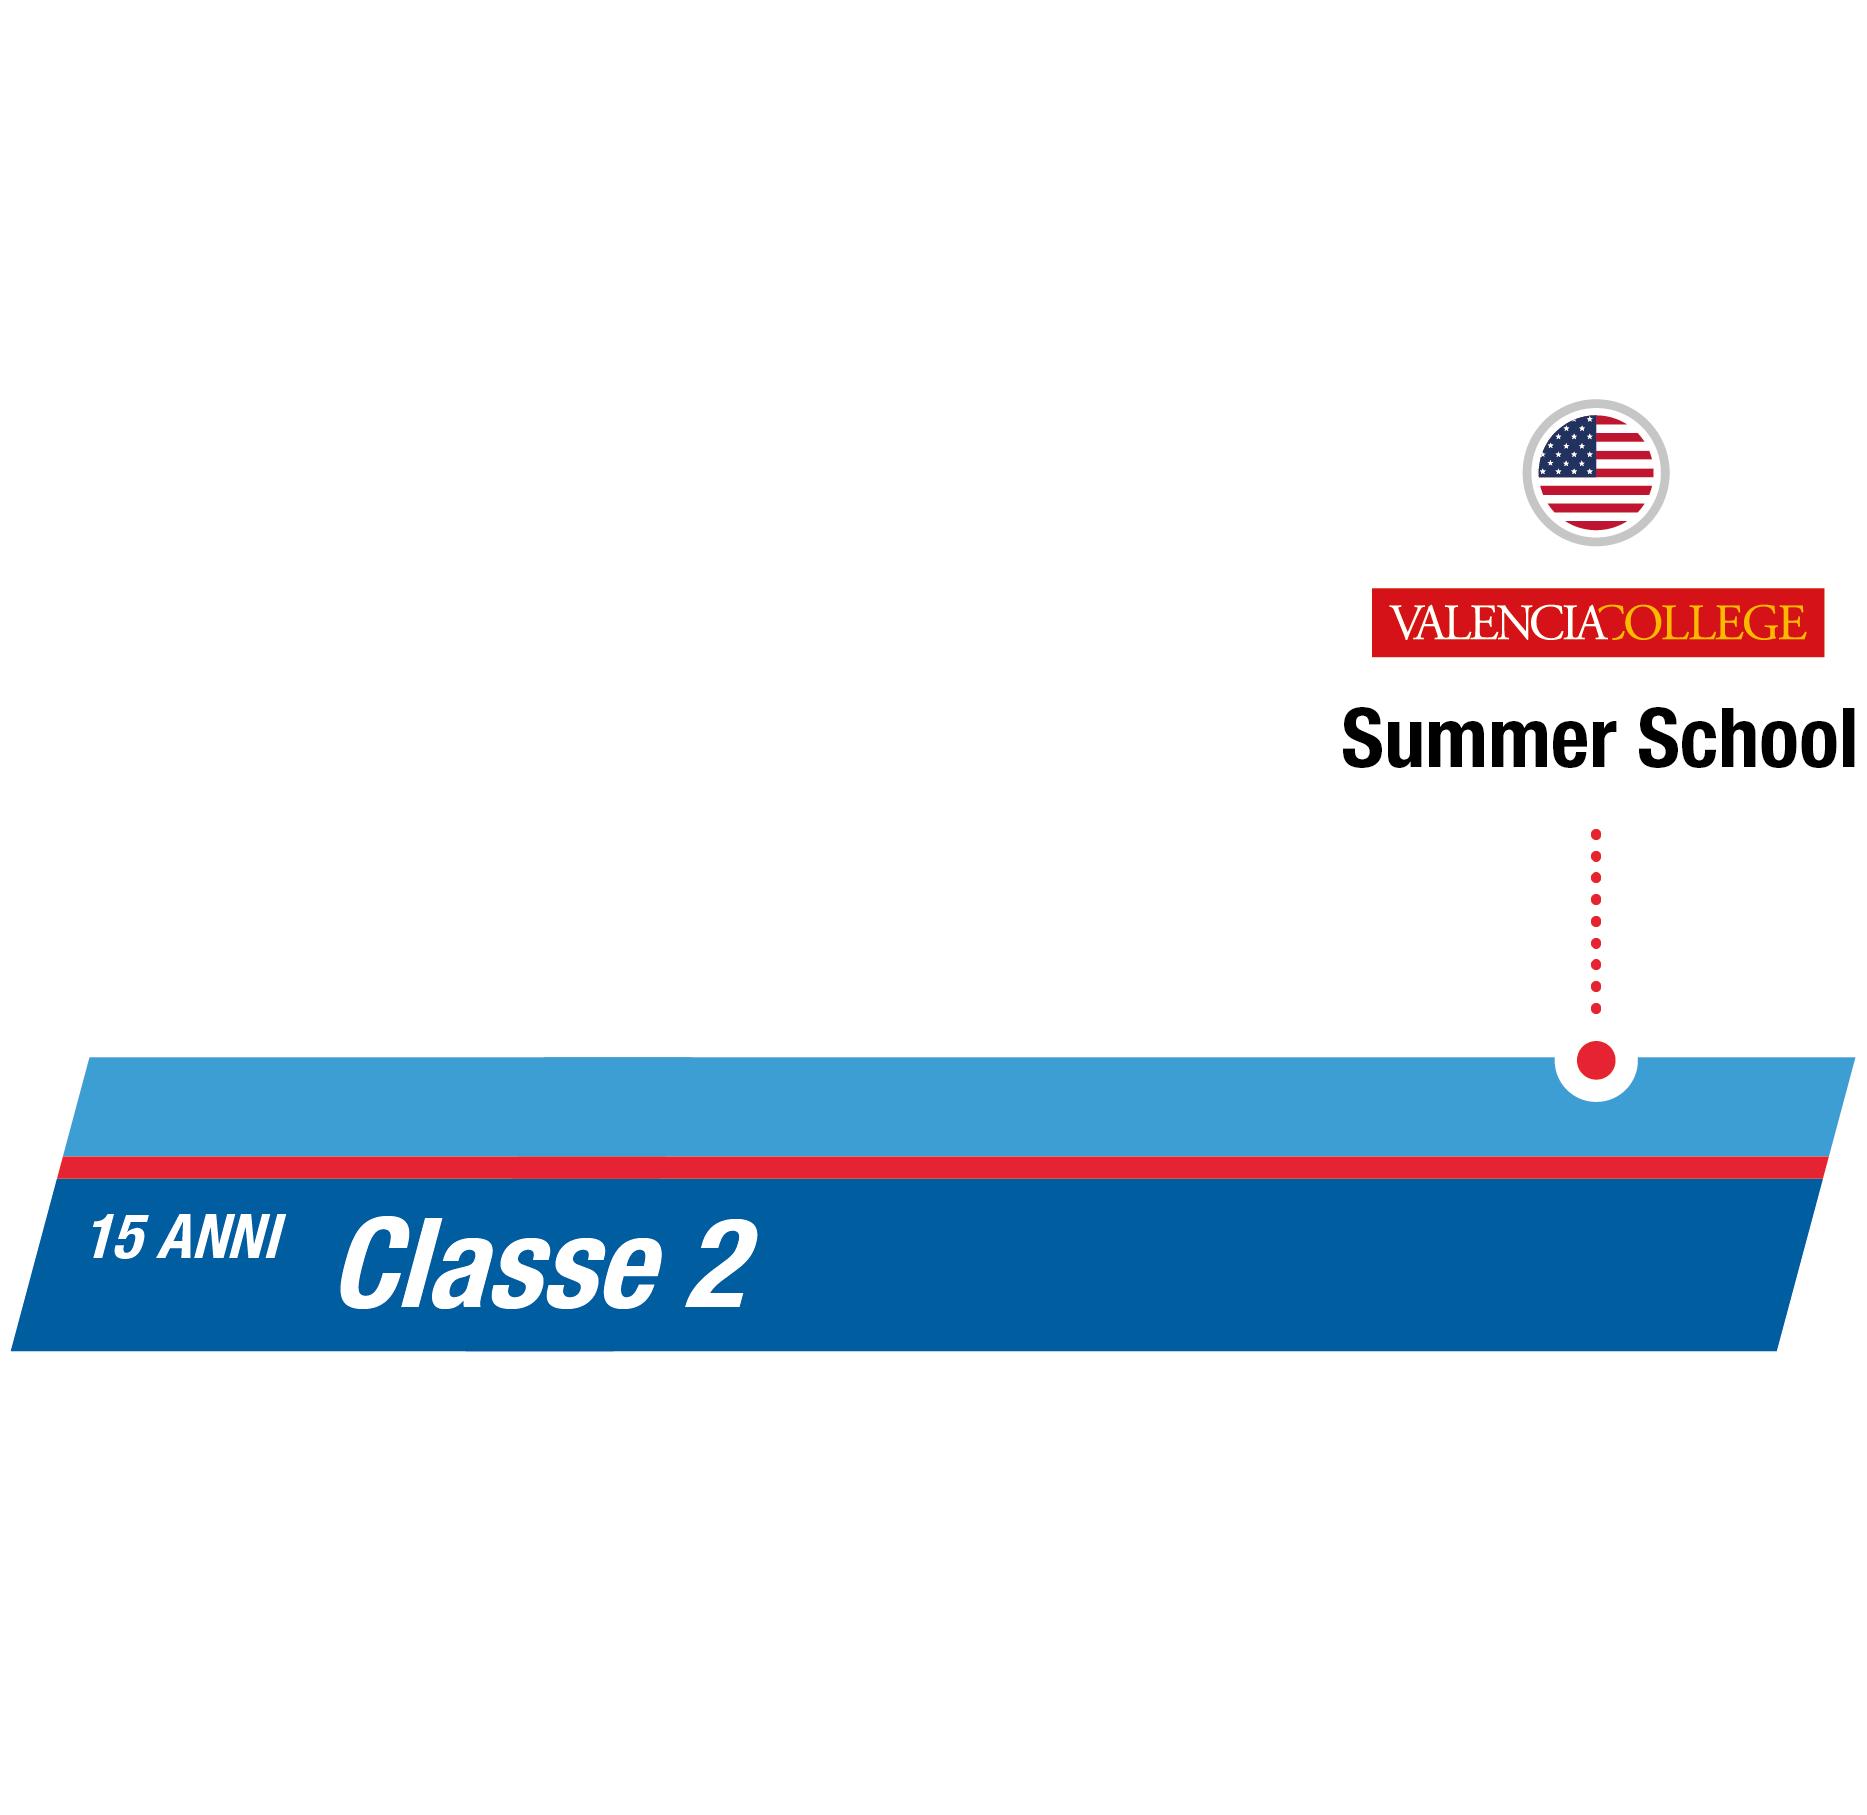 istituto-nobile-aviation-college-summerschool-2anno